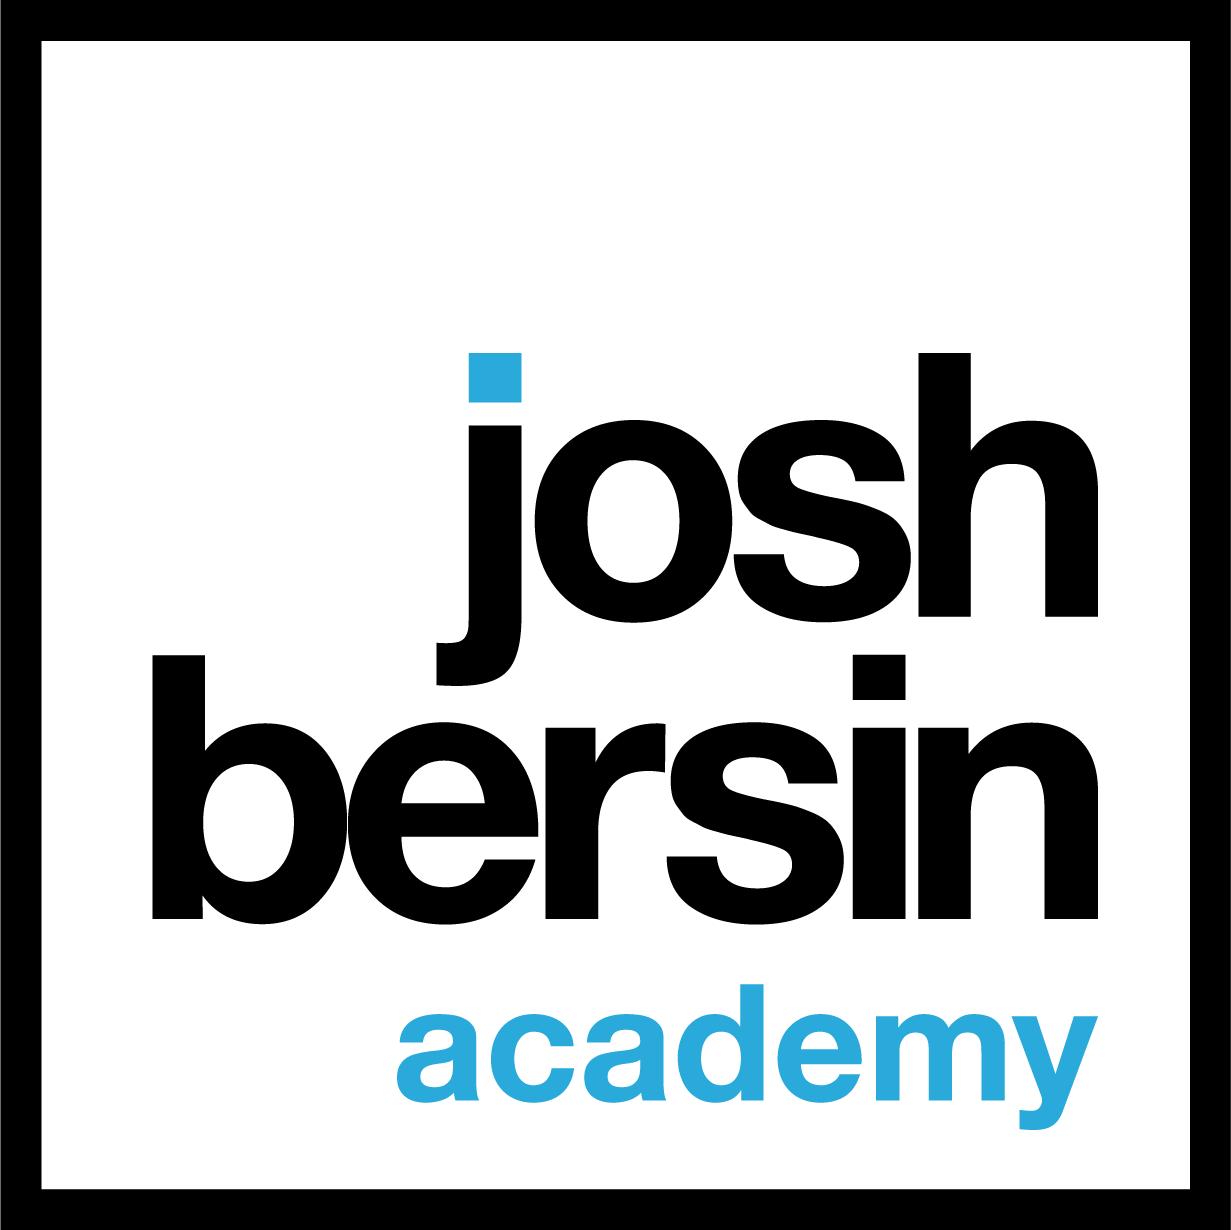 Josh Bersin Academy logo